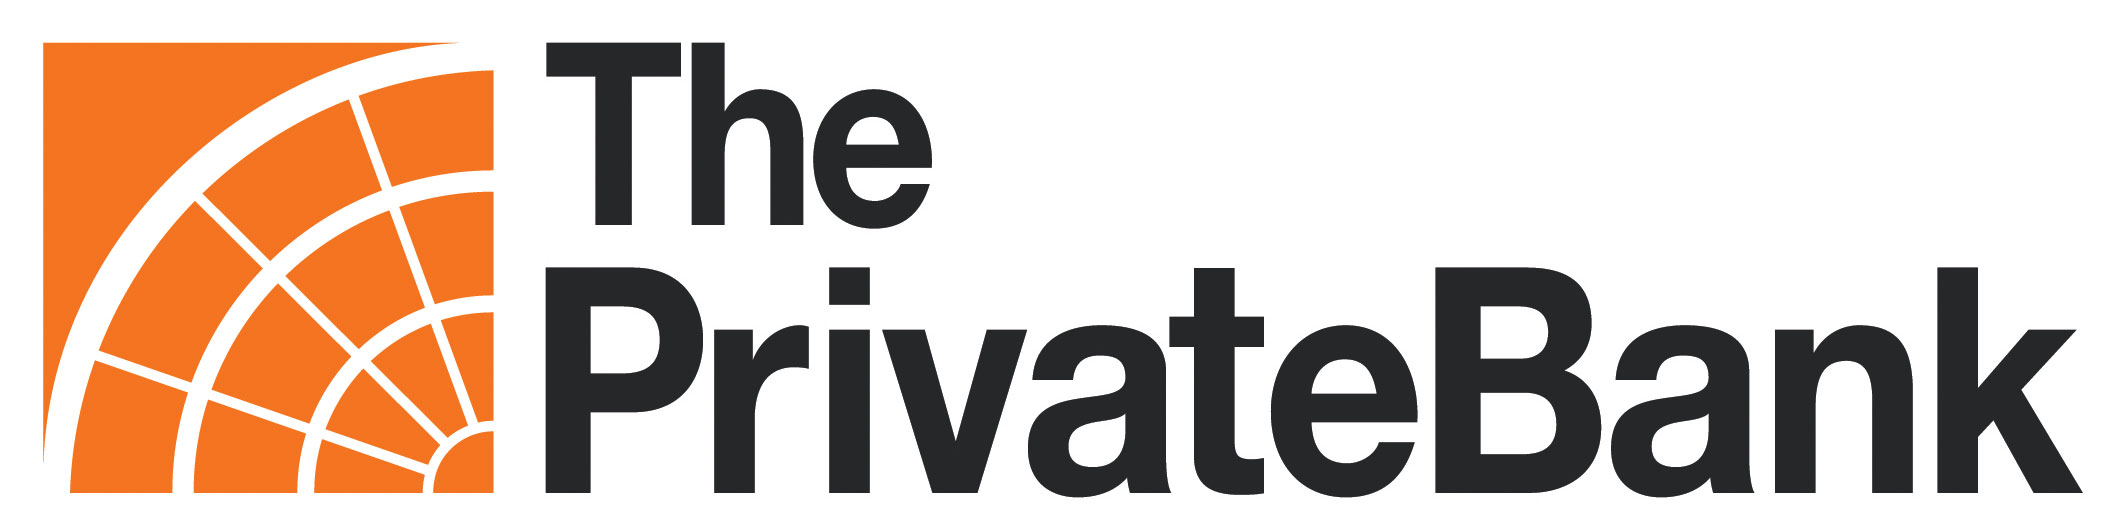 ThePrivateBank